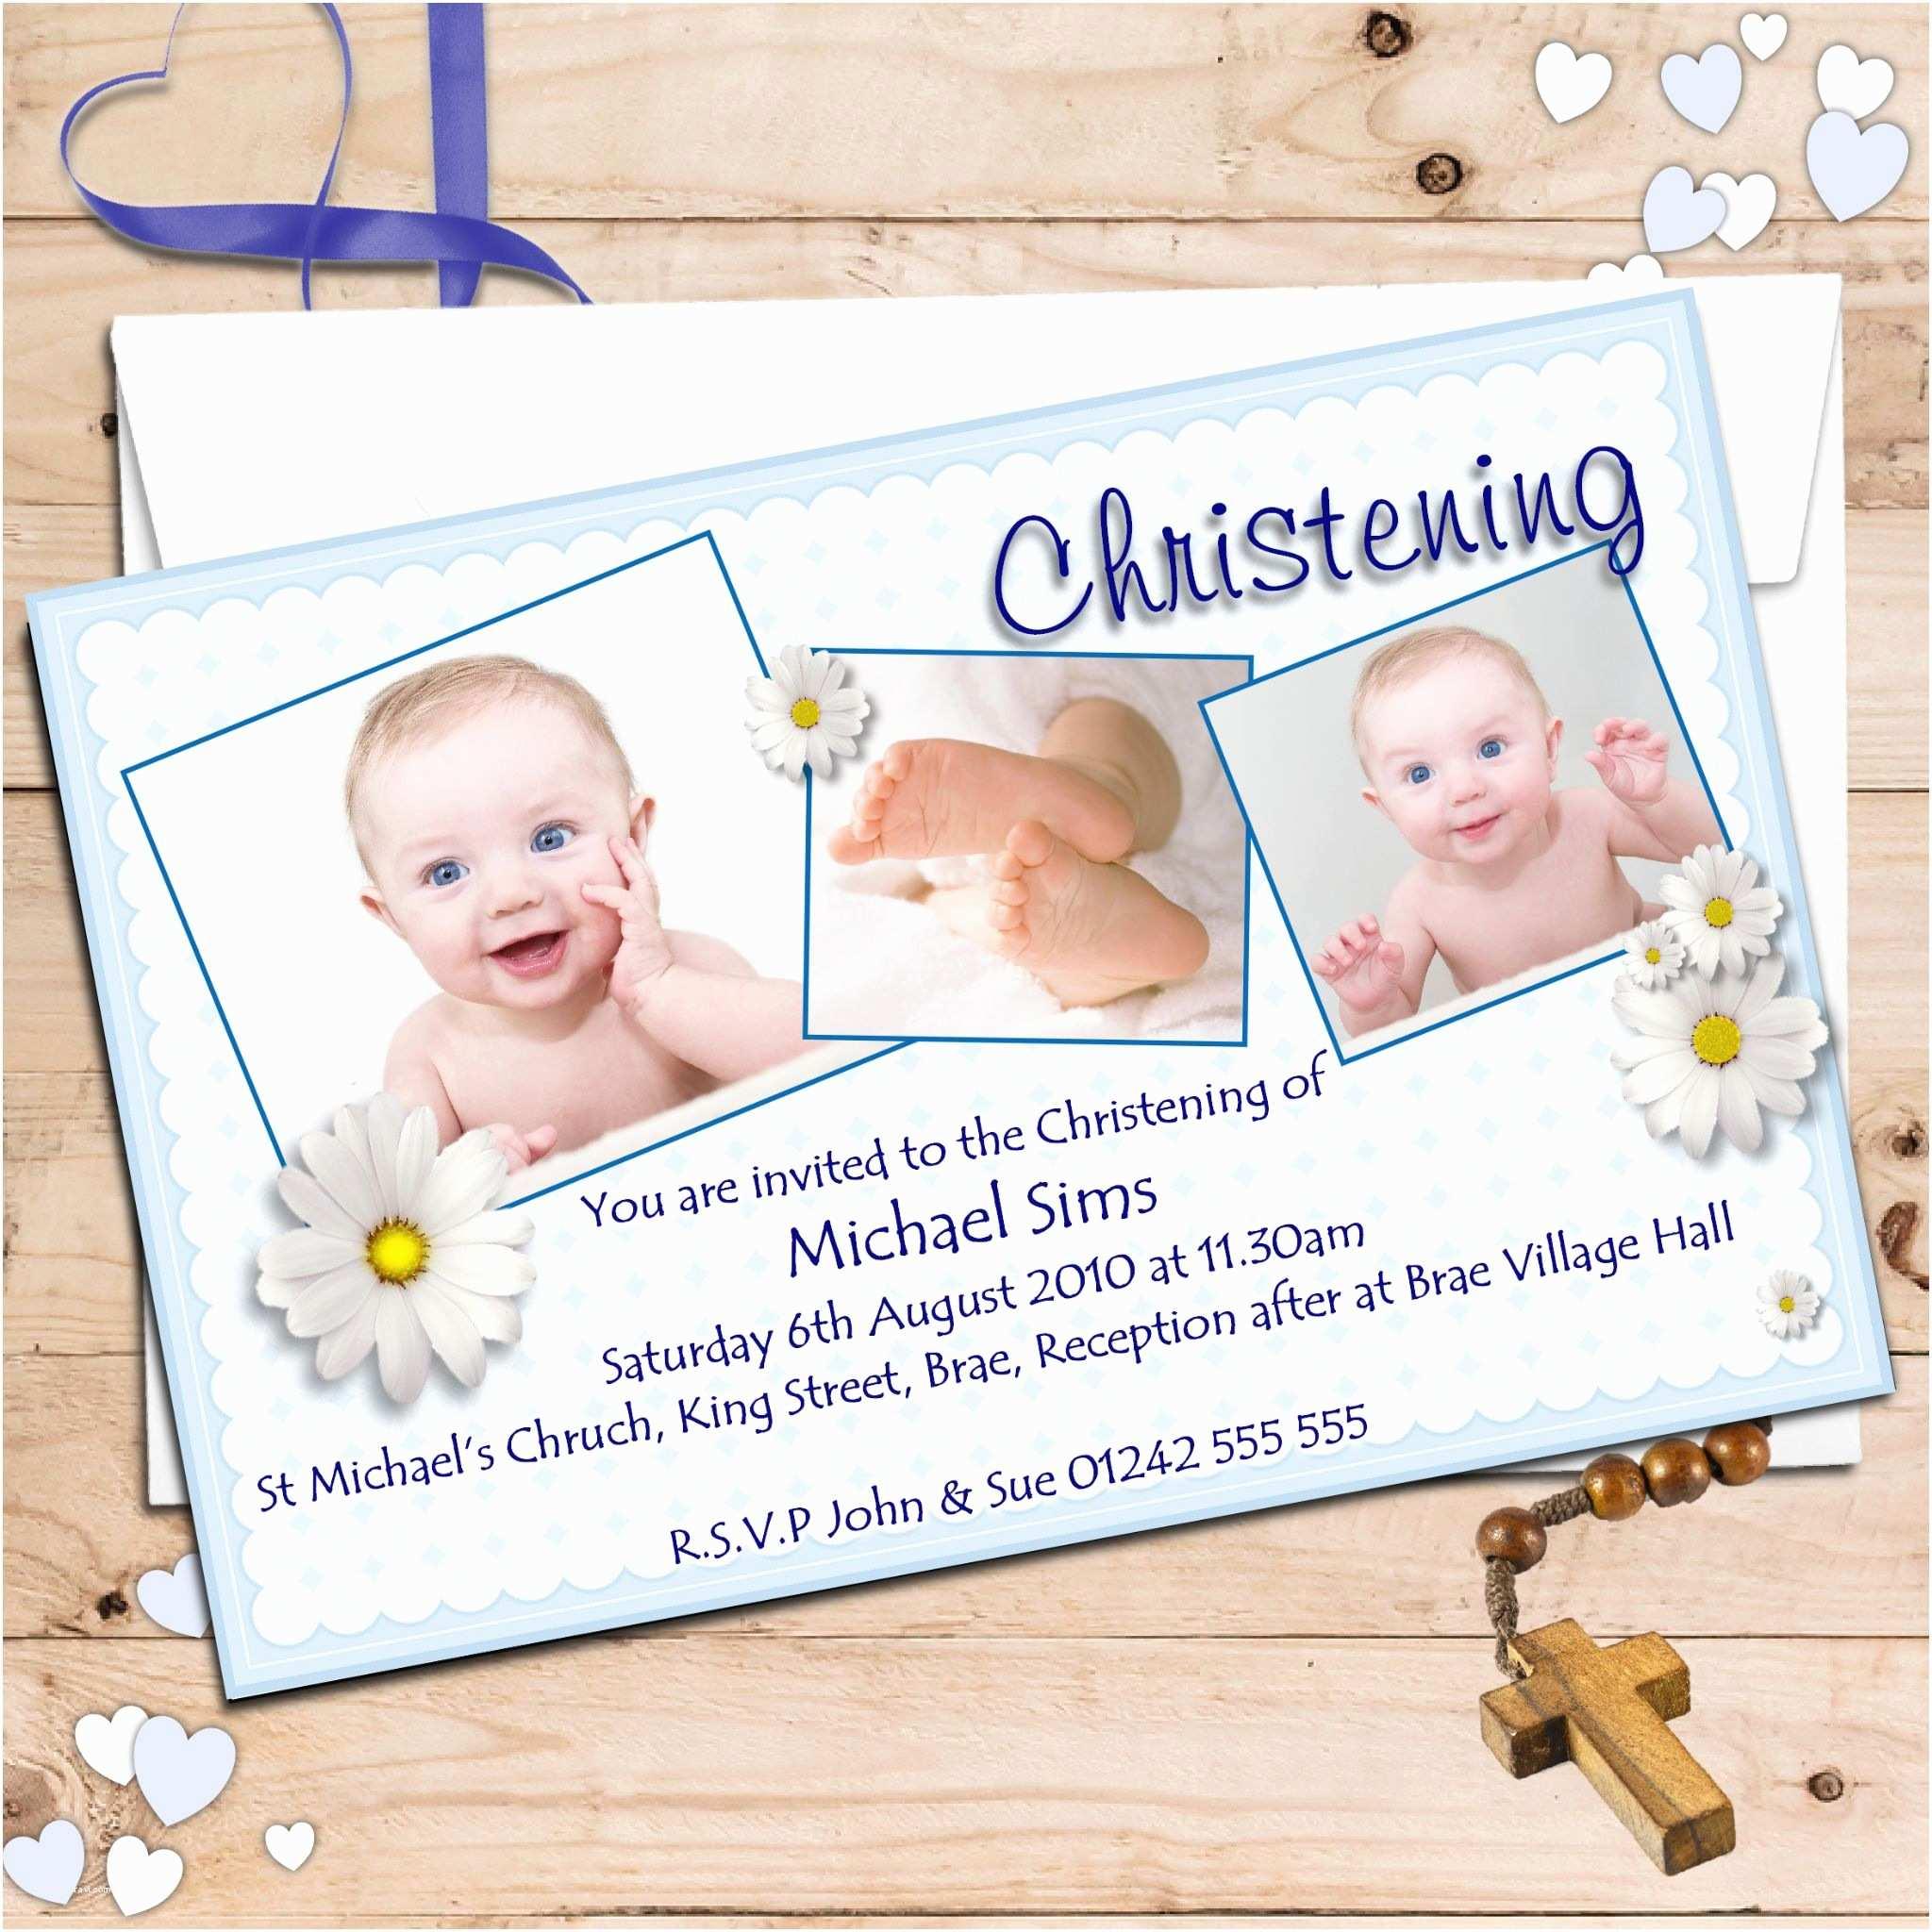 Baby Christening Invitations Personalised Christening Invitations Personalised